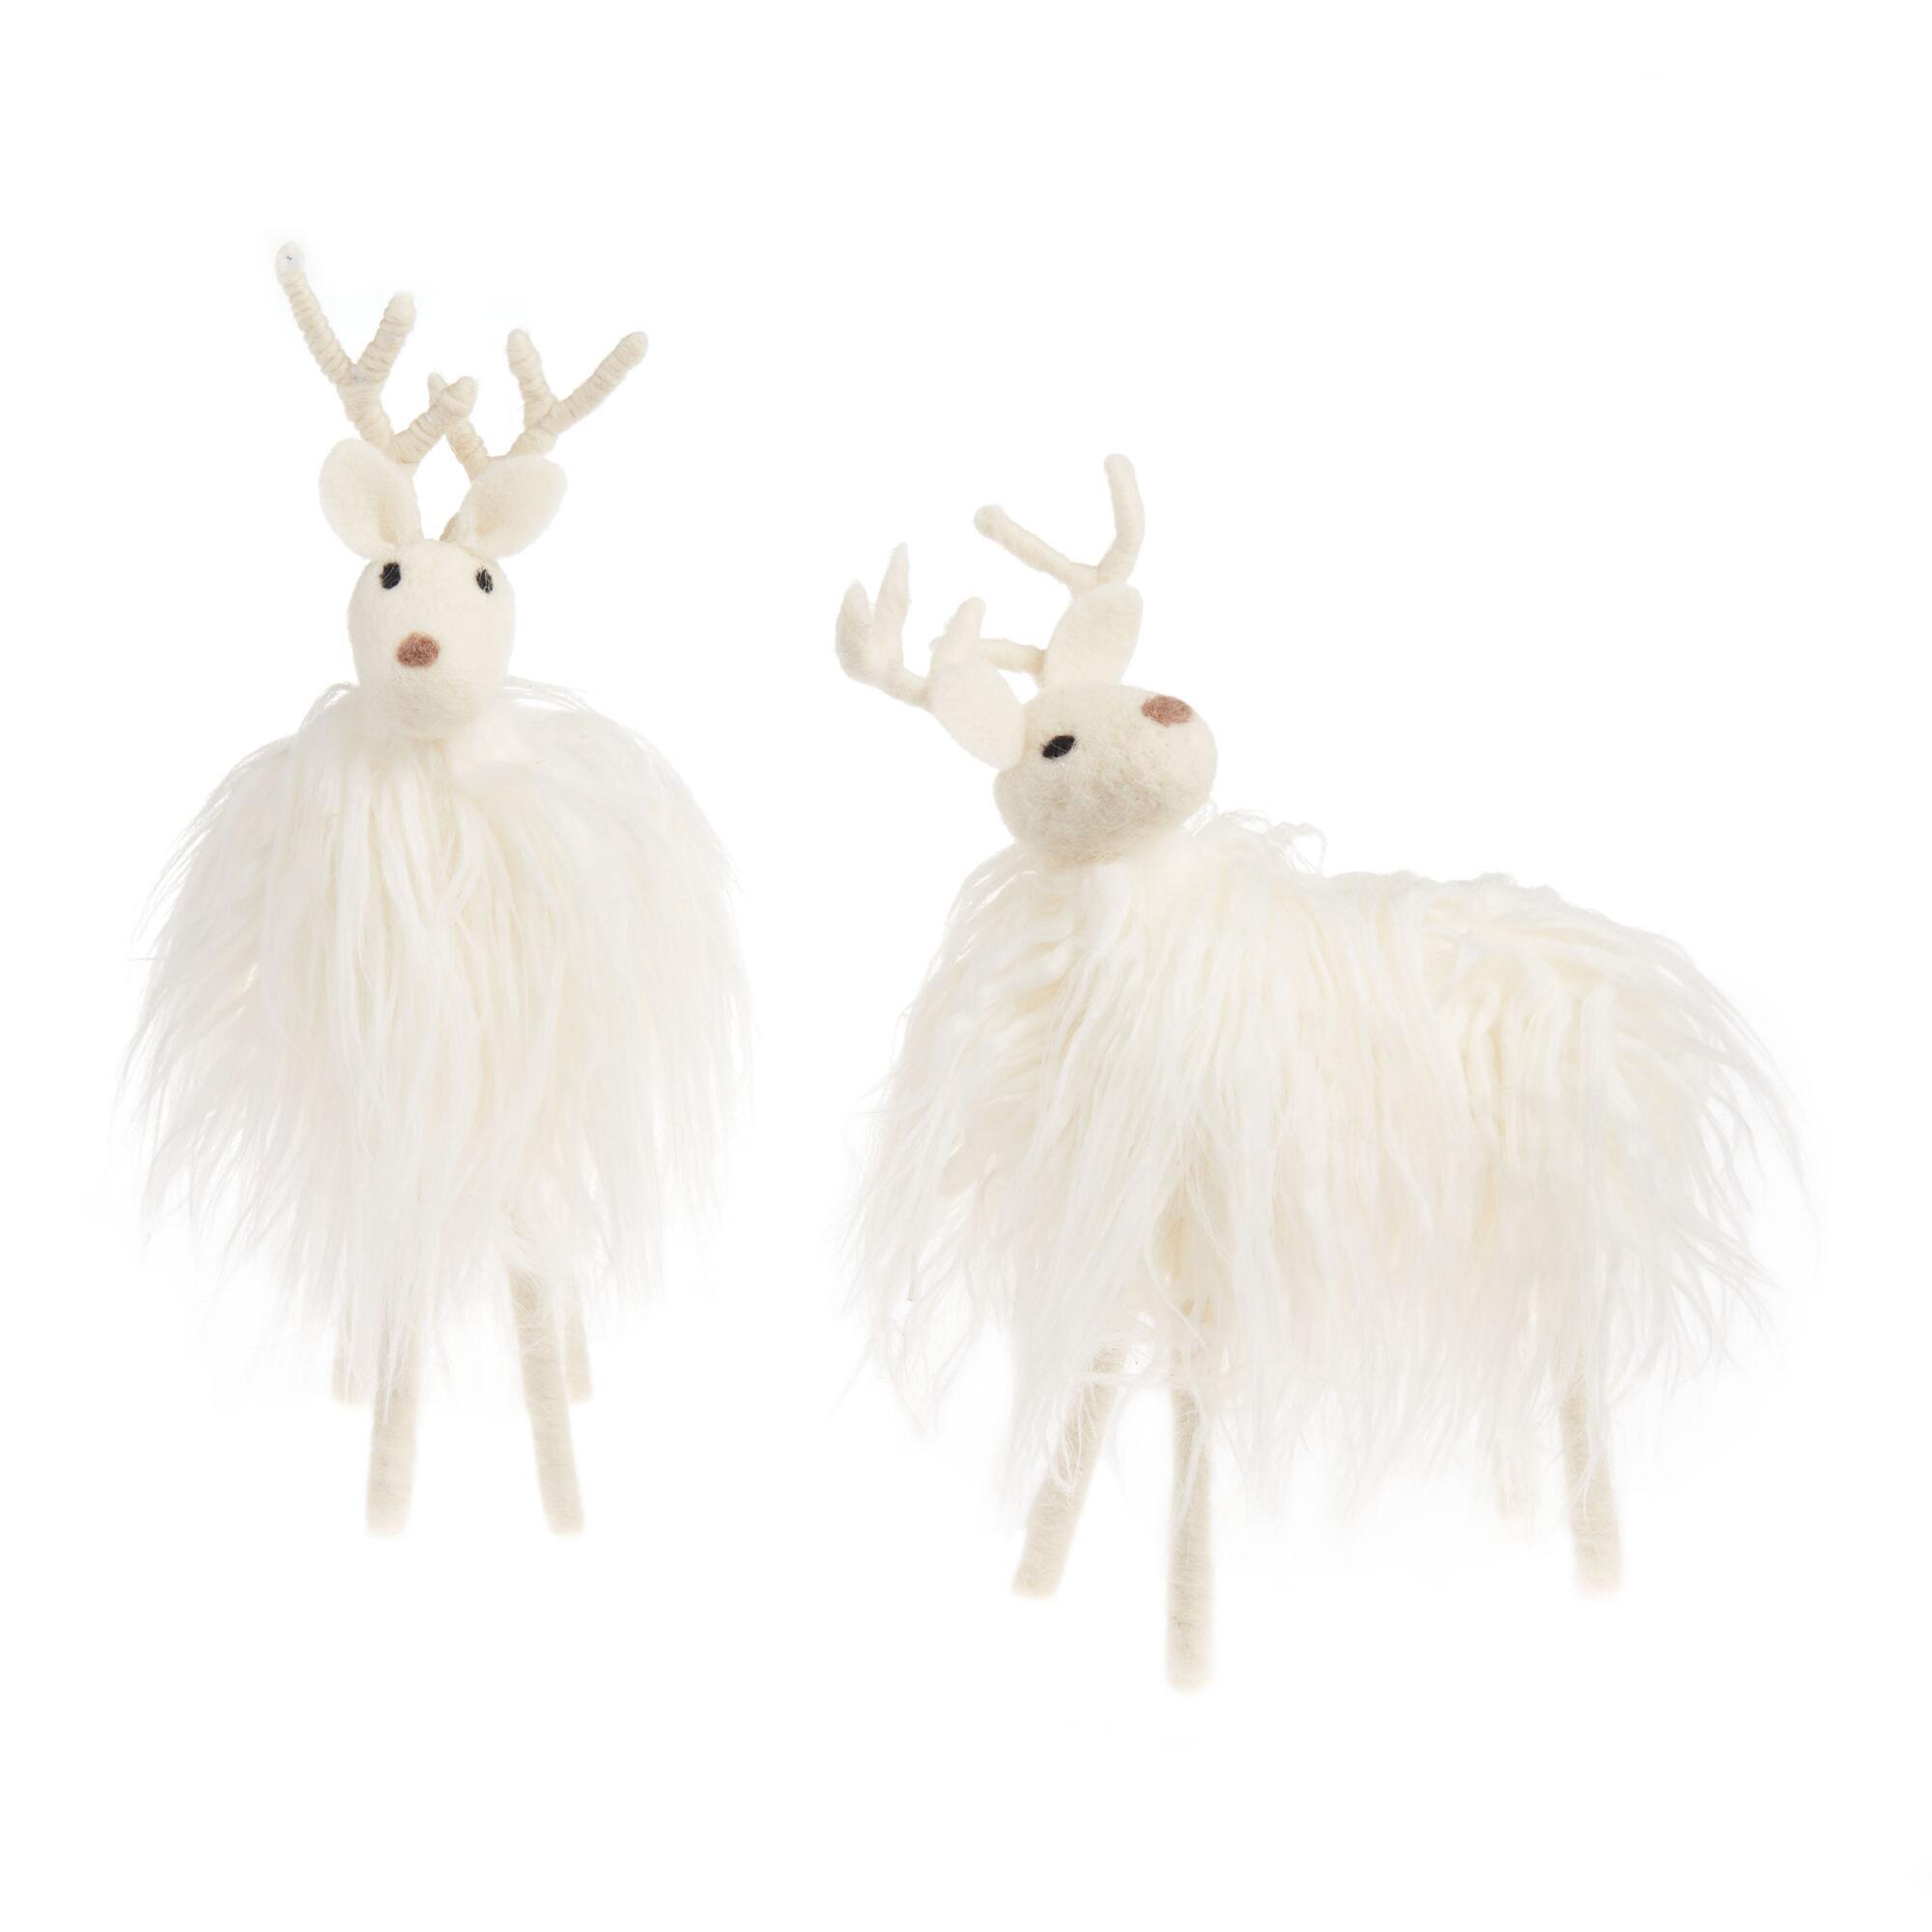 White Woolly Faux Fur Deer Decor Set Of 2 $25.98